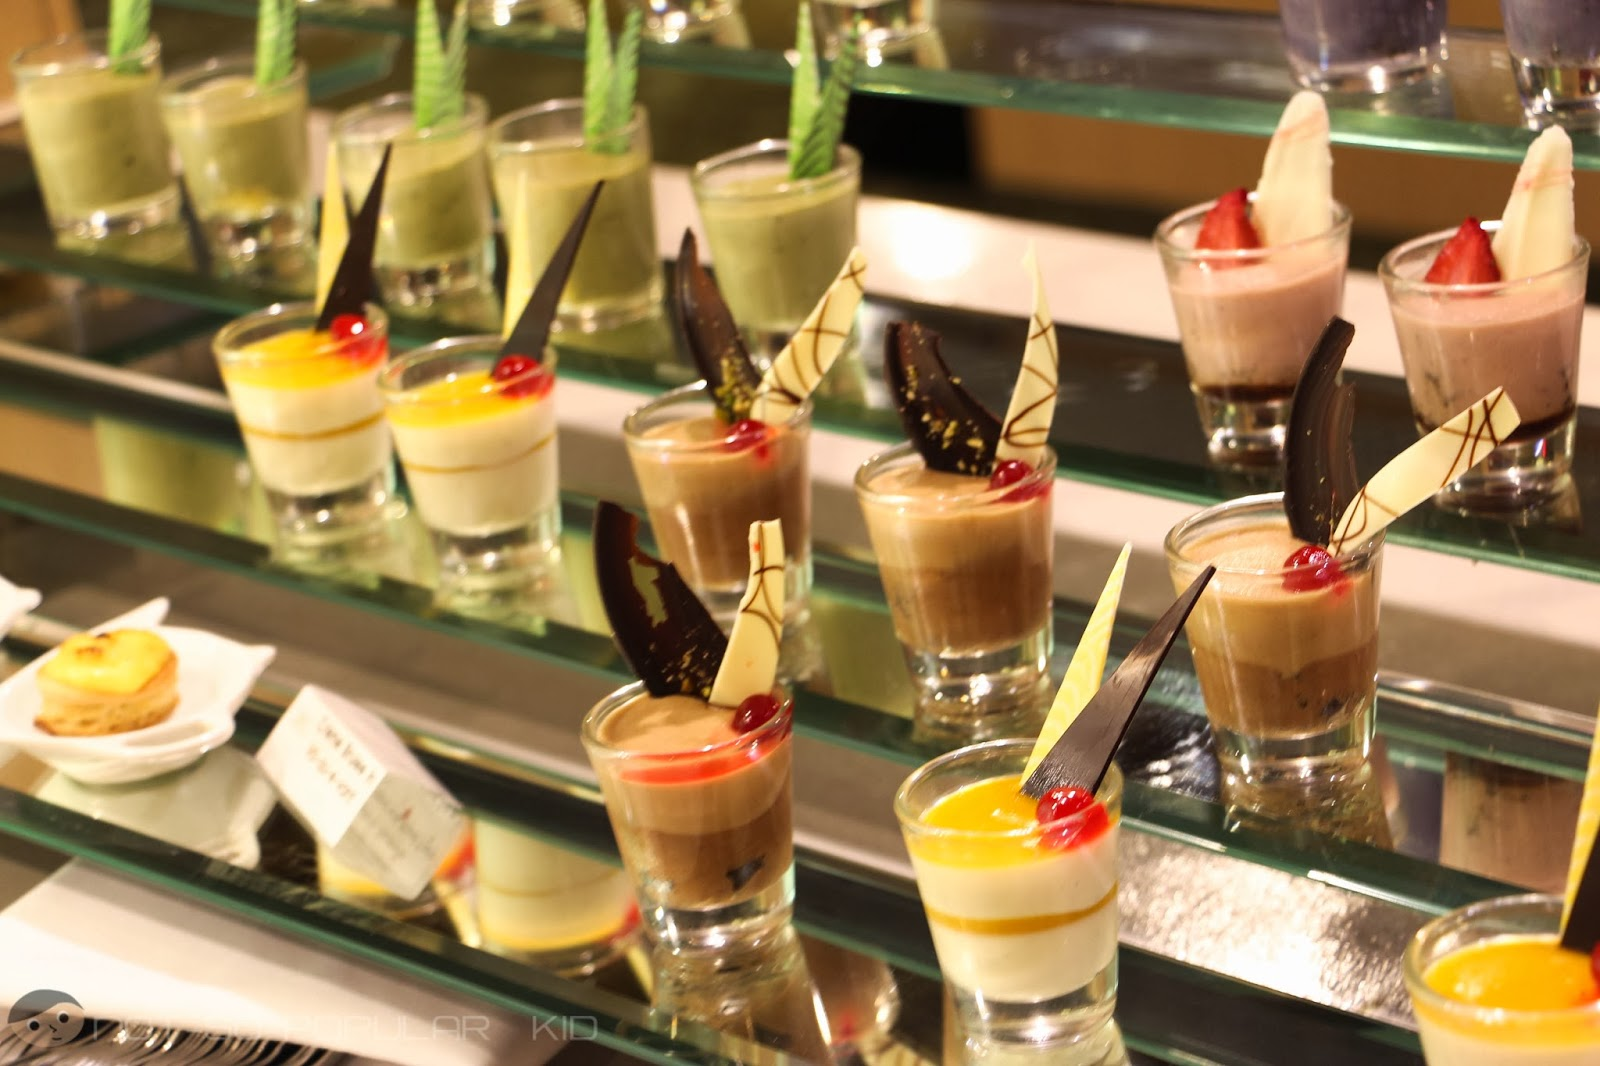 Desserts in a shot-glass in Midas Cafe!